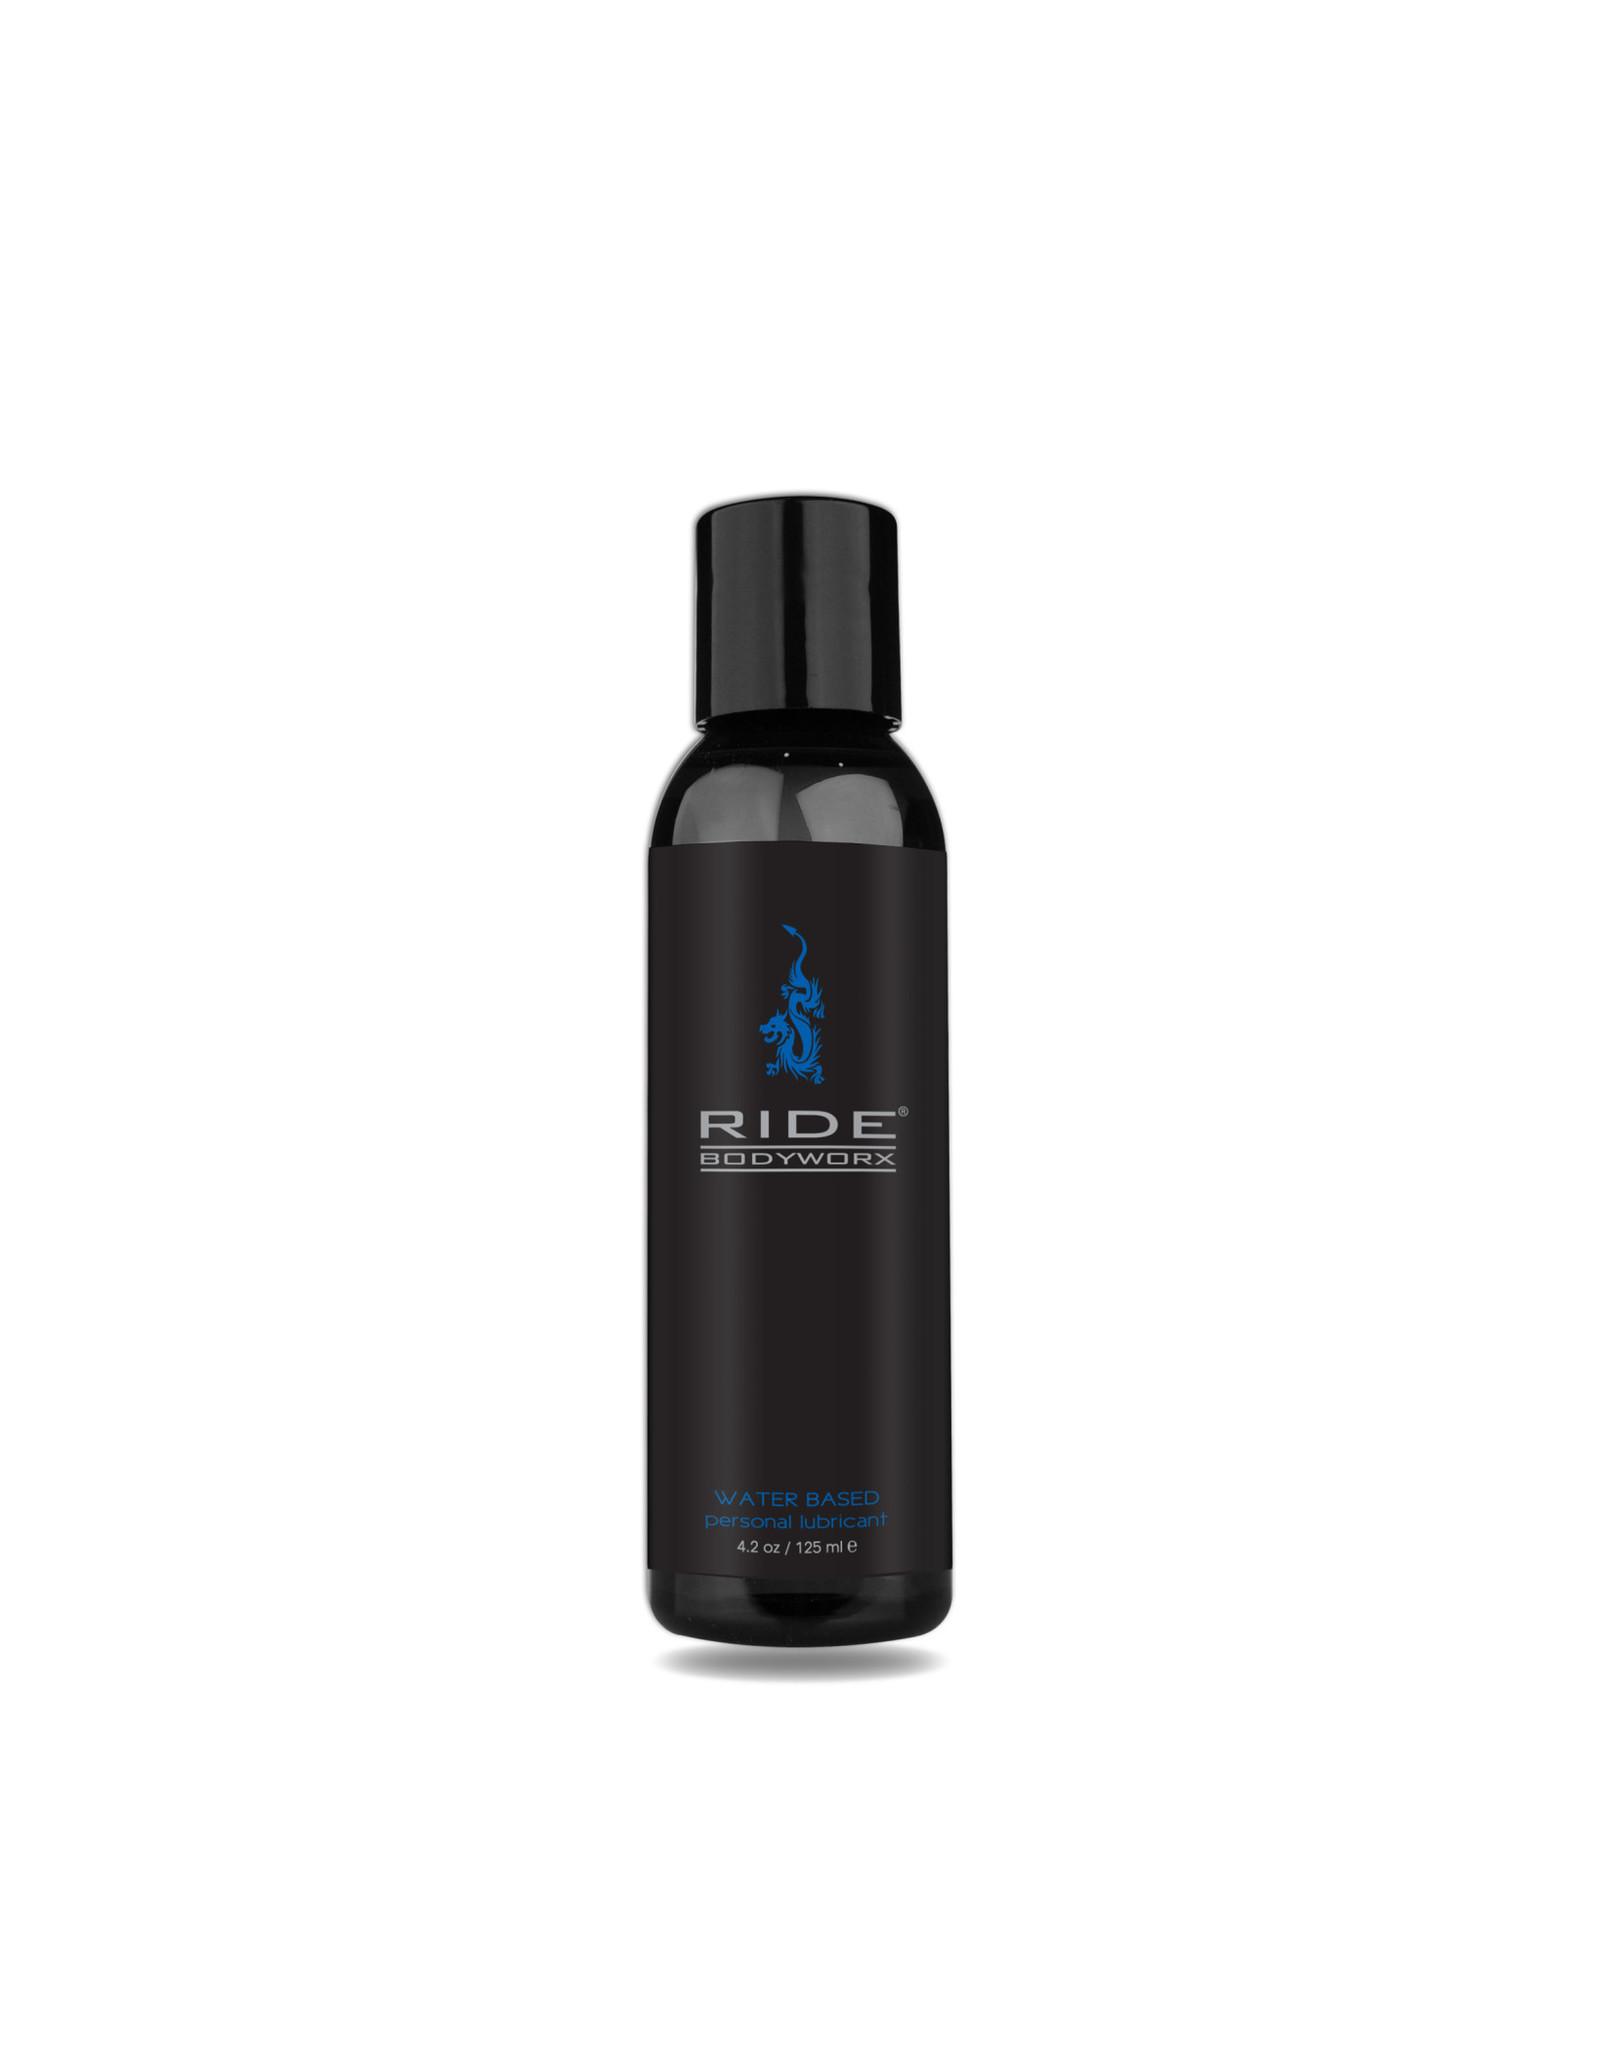 Sliquid Ride BodyWorx Water Based